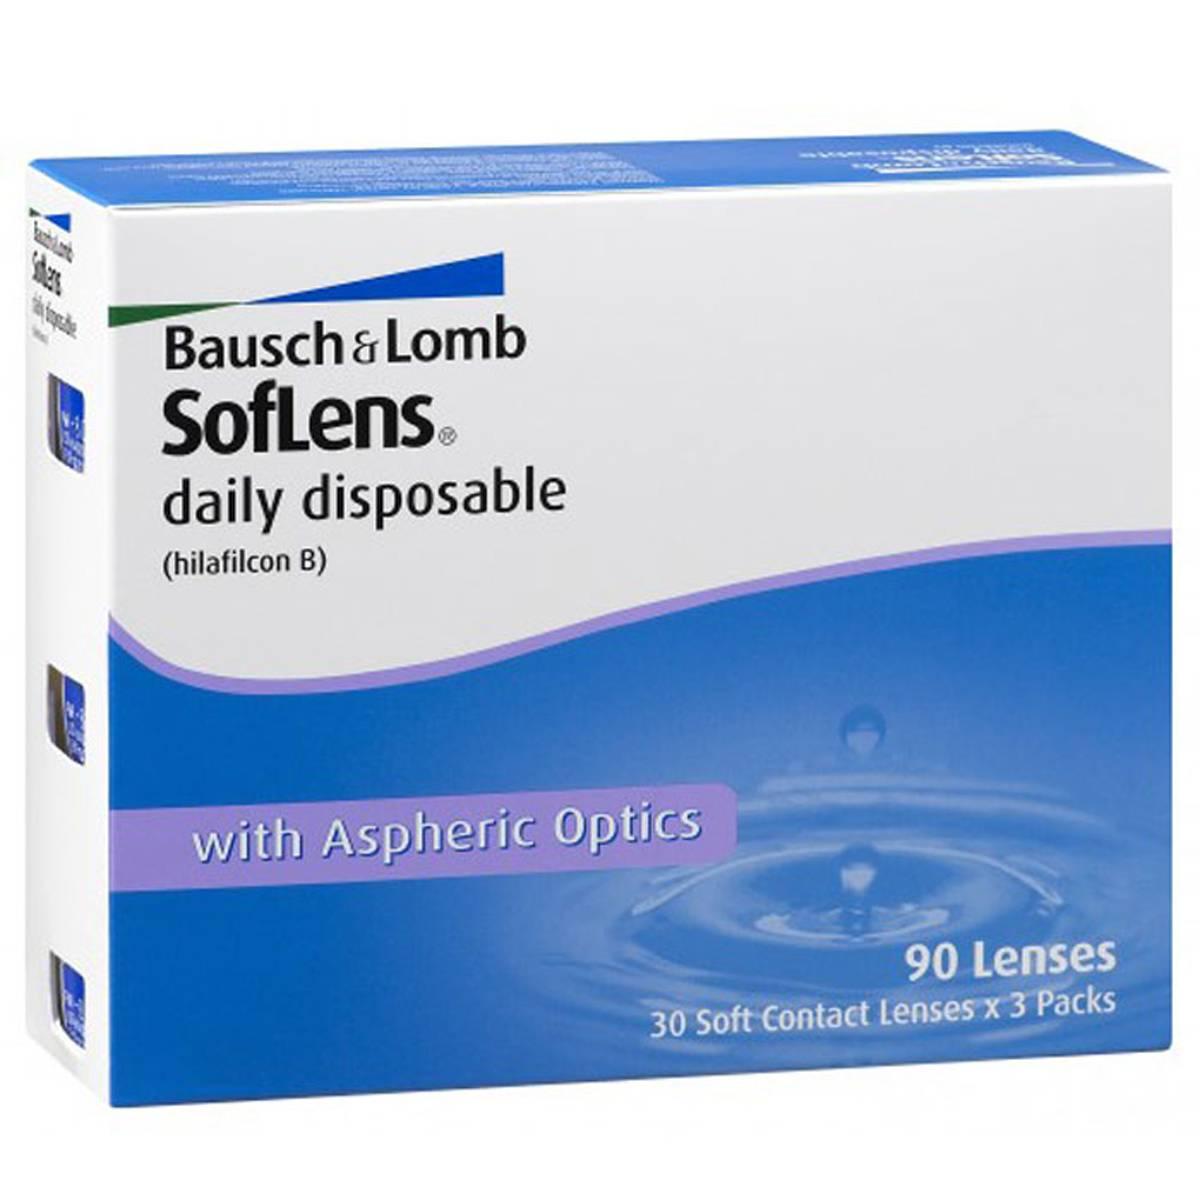 Bausch & lomb soflens daily disposable (30 линз): отзывы, описание модели, характеристики, цена, обзор, сравнение, фото